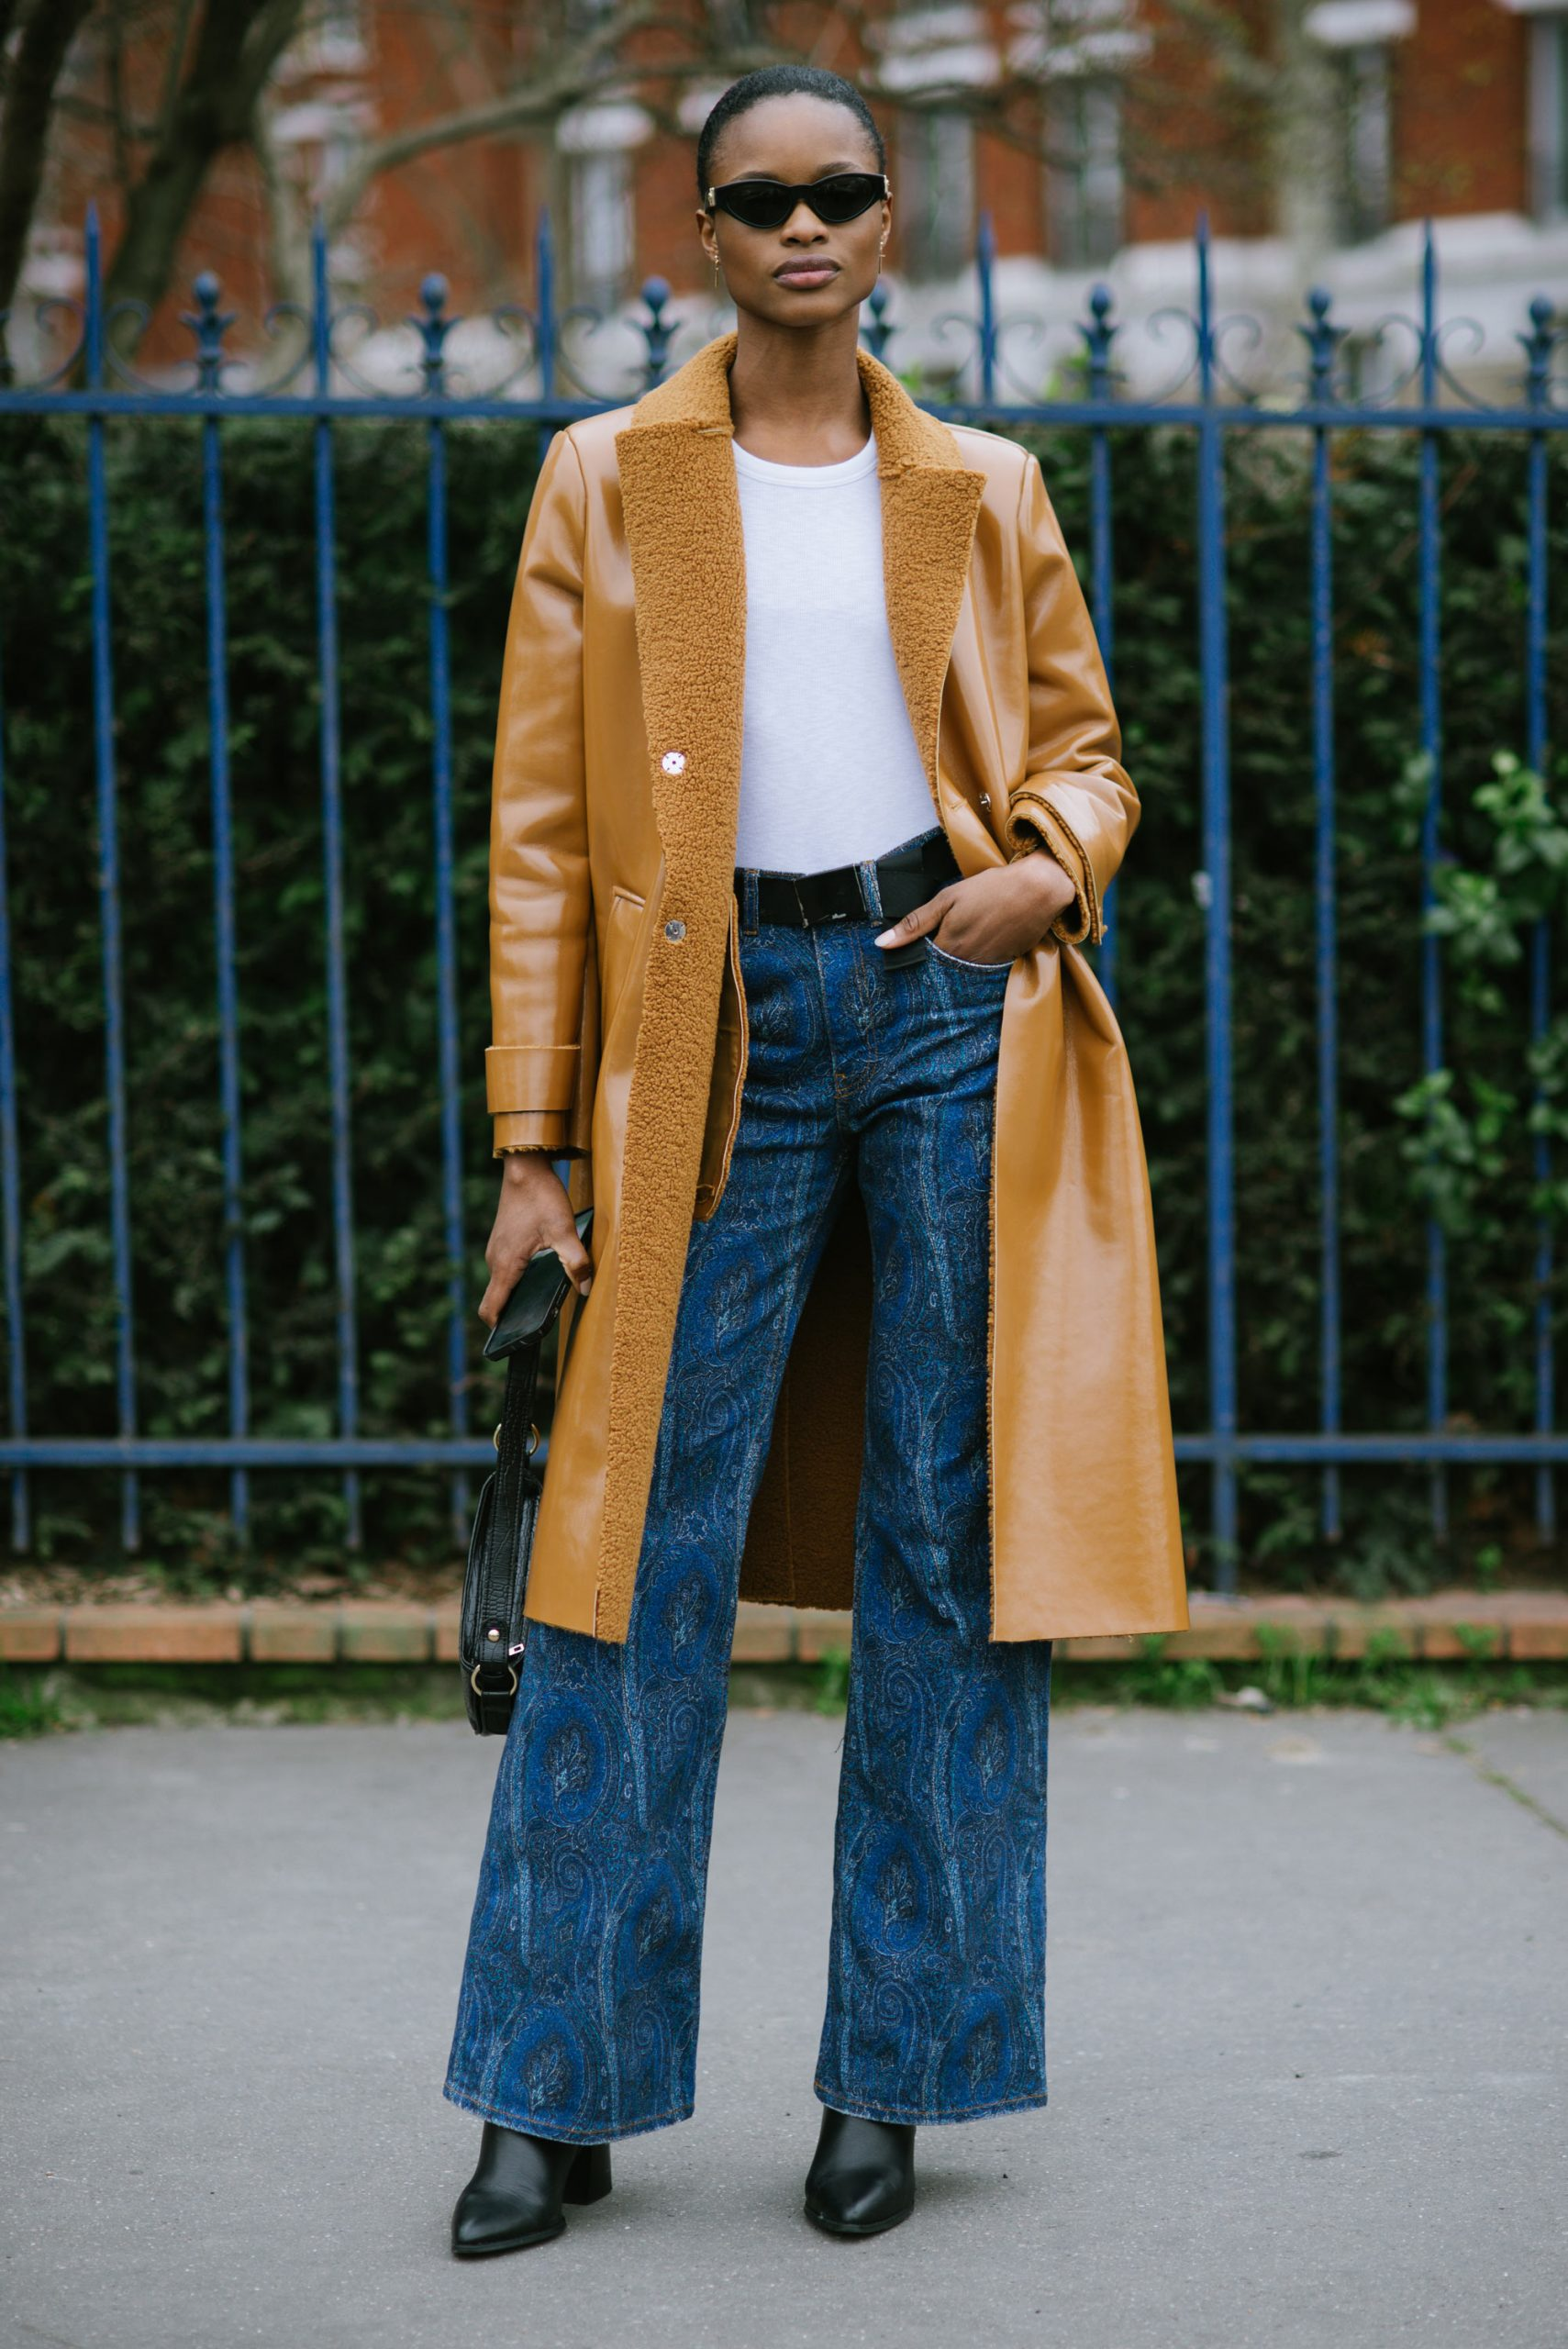 Trend Alert: Moda Vintage